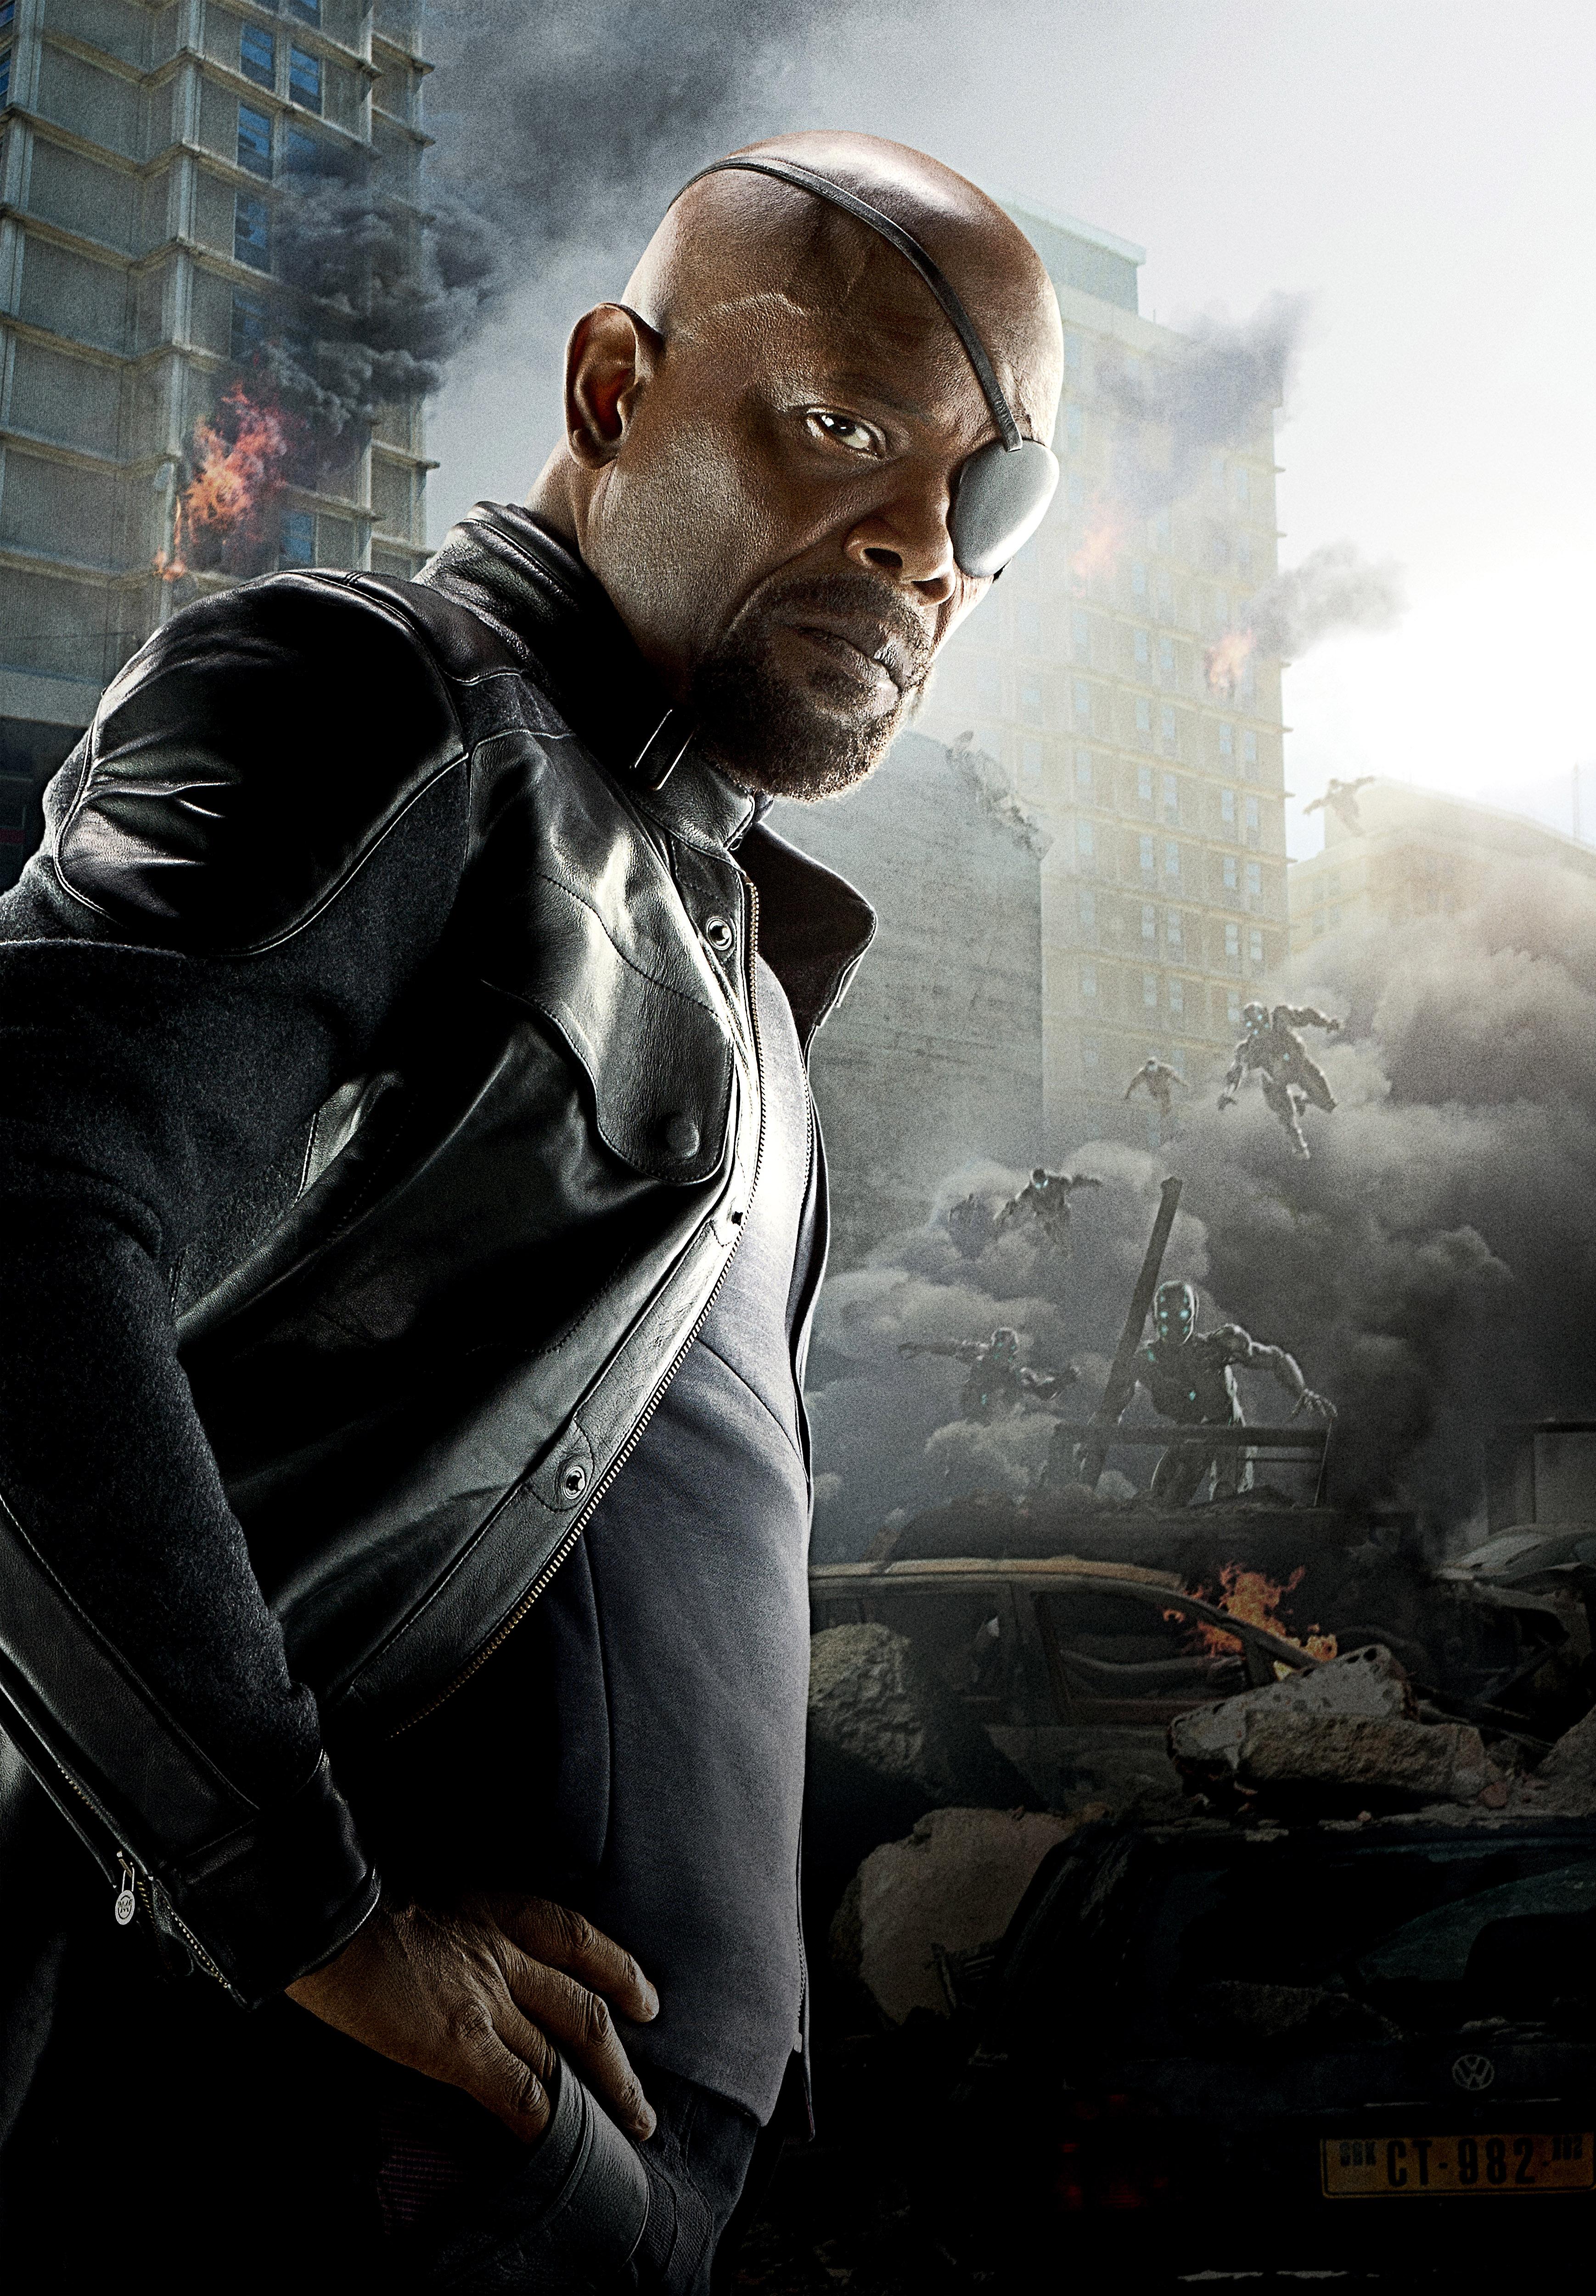 Nick Fury (Marvel Cinematic Universe)